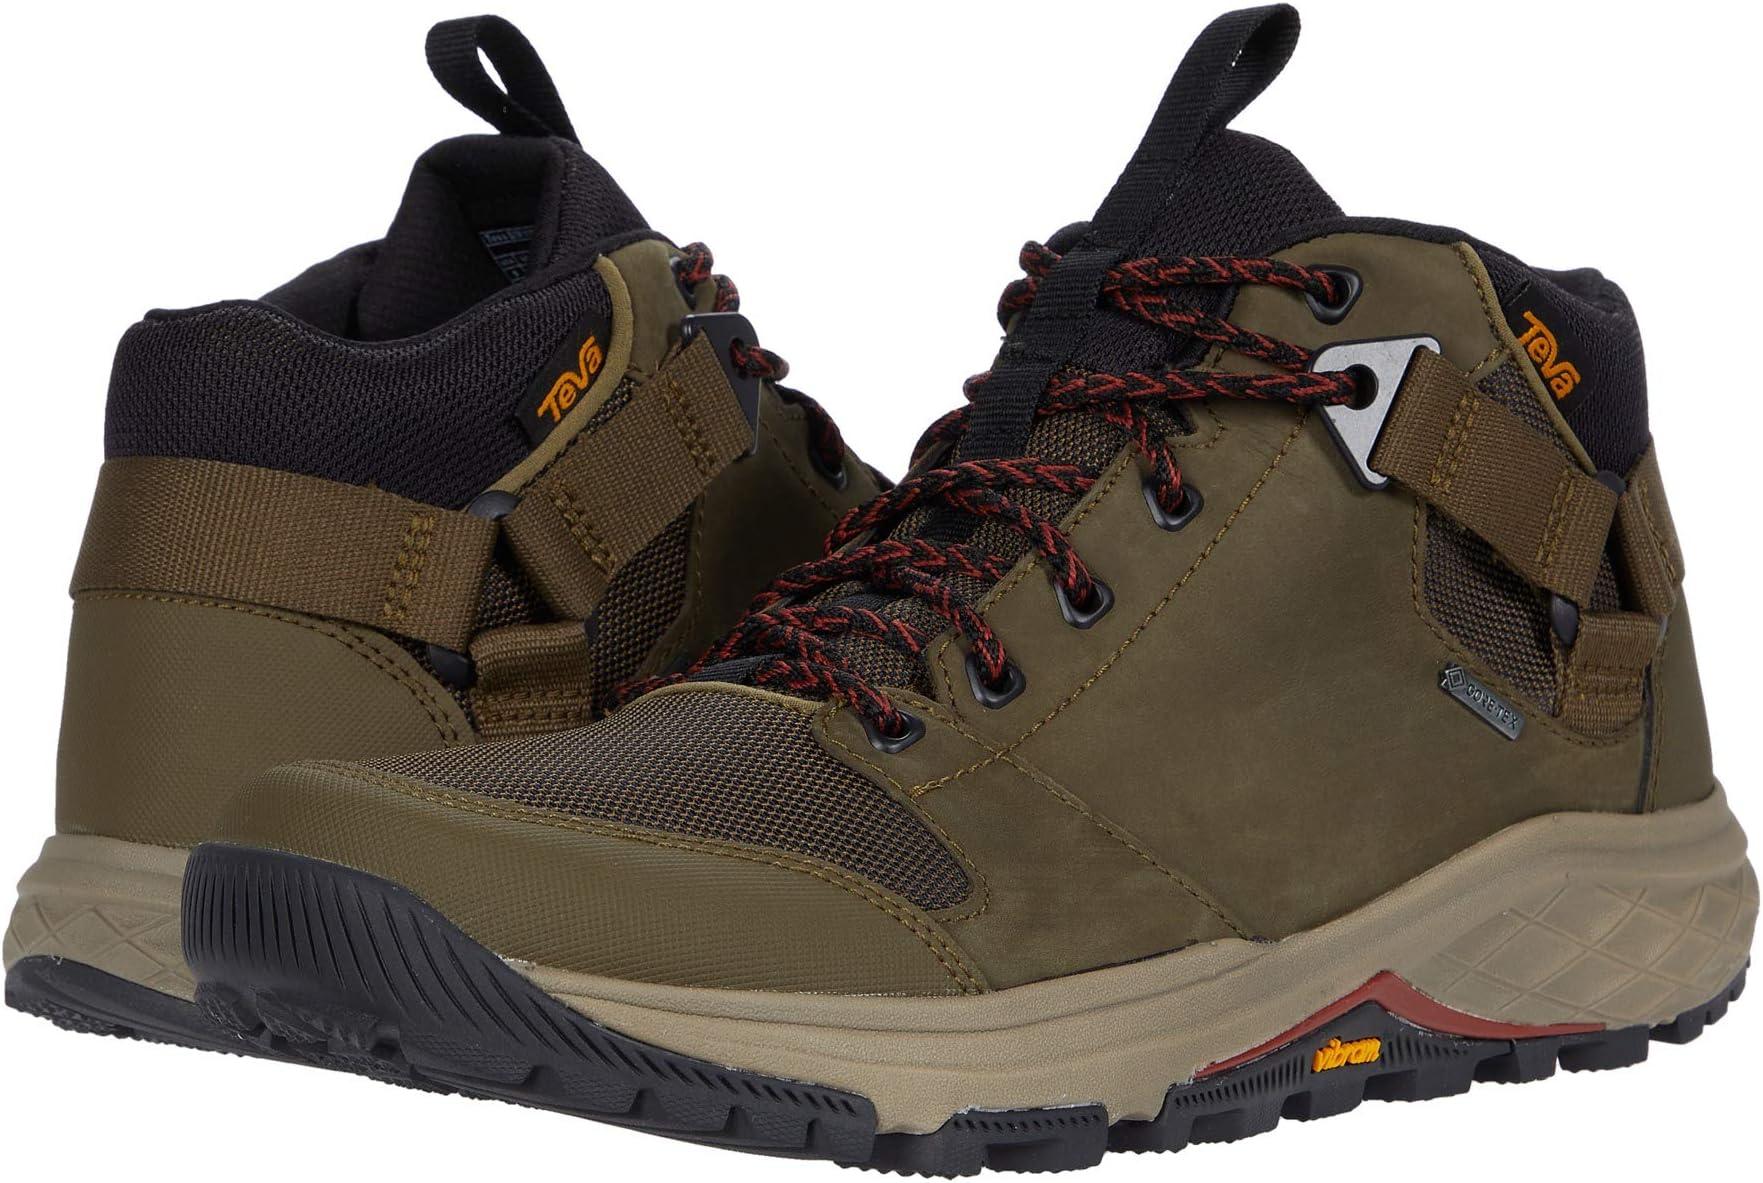 TC-4-Hiking-2020-03-13